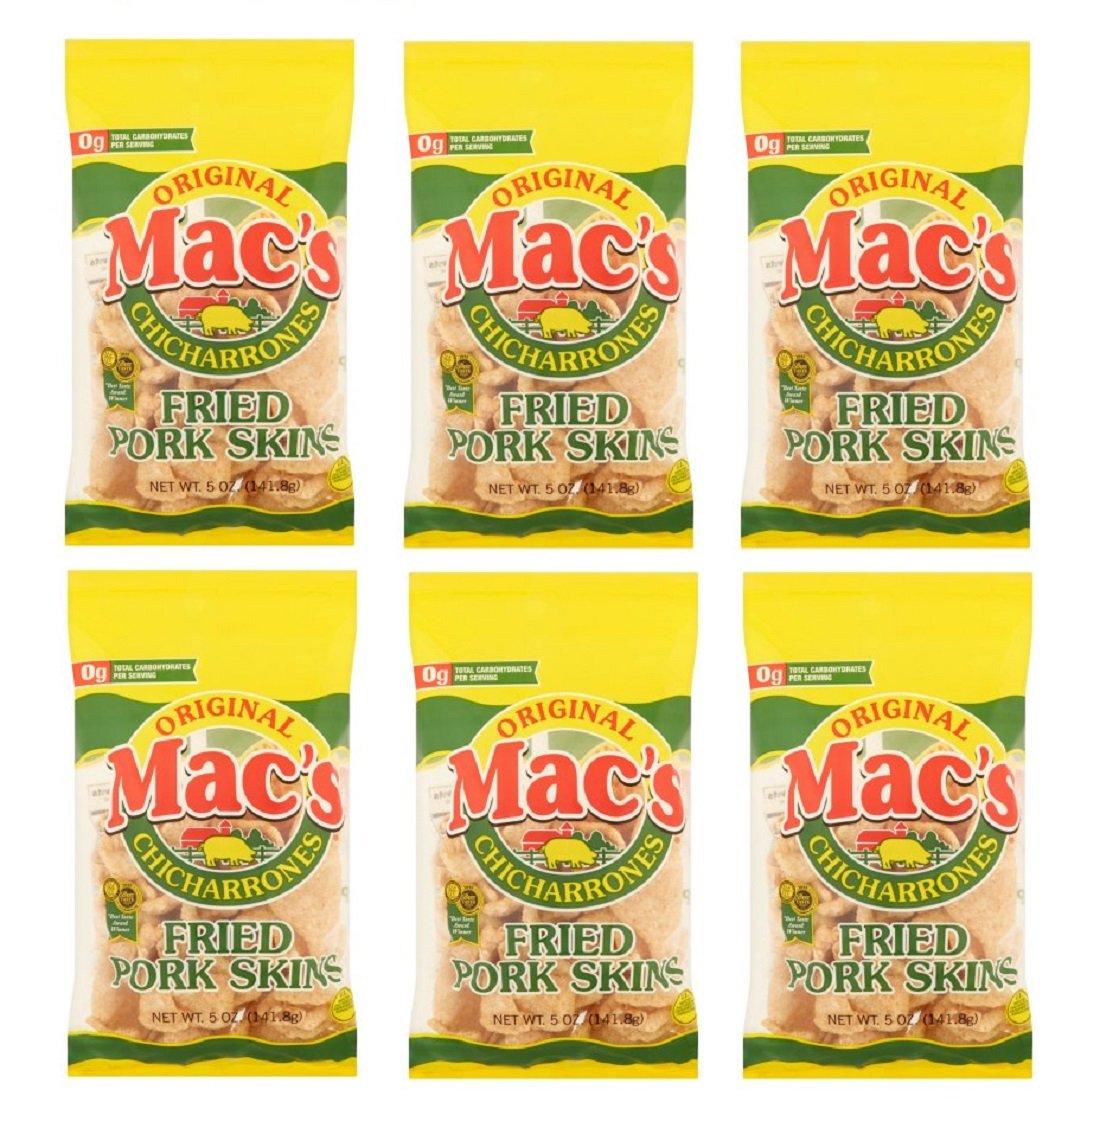 Mac's Chicharrones Original Fried Pork Skins 6 Nashville-Davidson Mall Pack oz Ranking TOP20 5 of